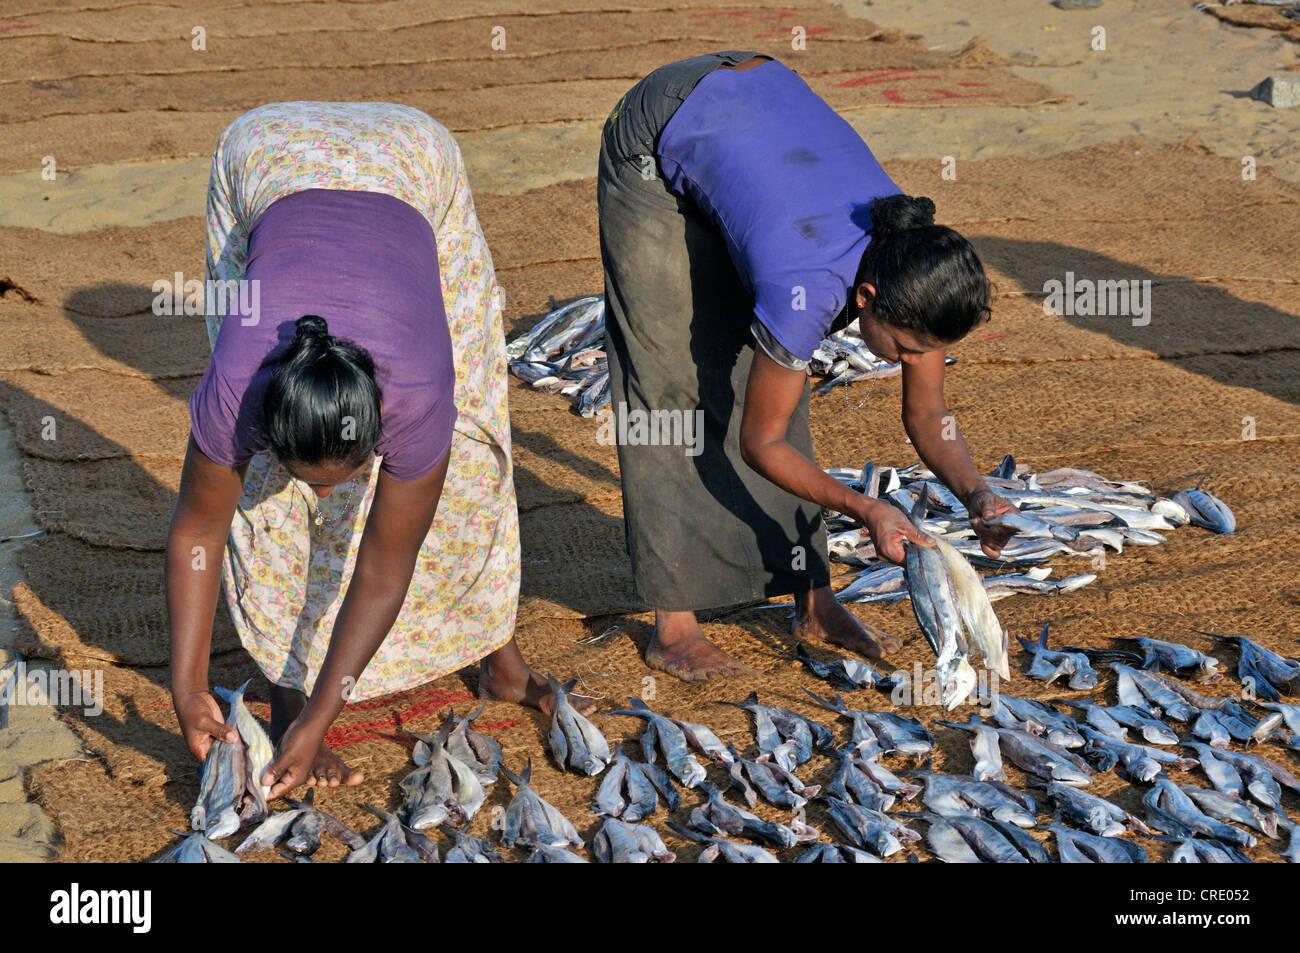 Dried fish, fish drying on coconut mats on the beach, women's work, Negombo, Sri Lanka, South Asia, Asia - Stock Image